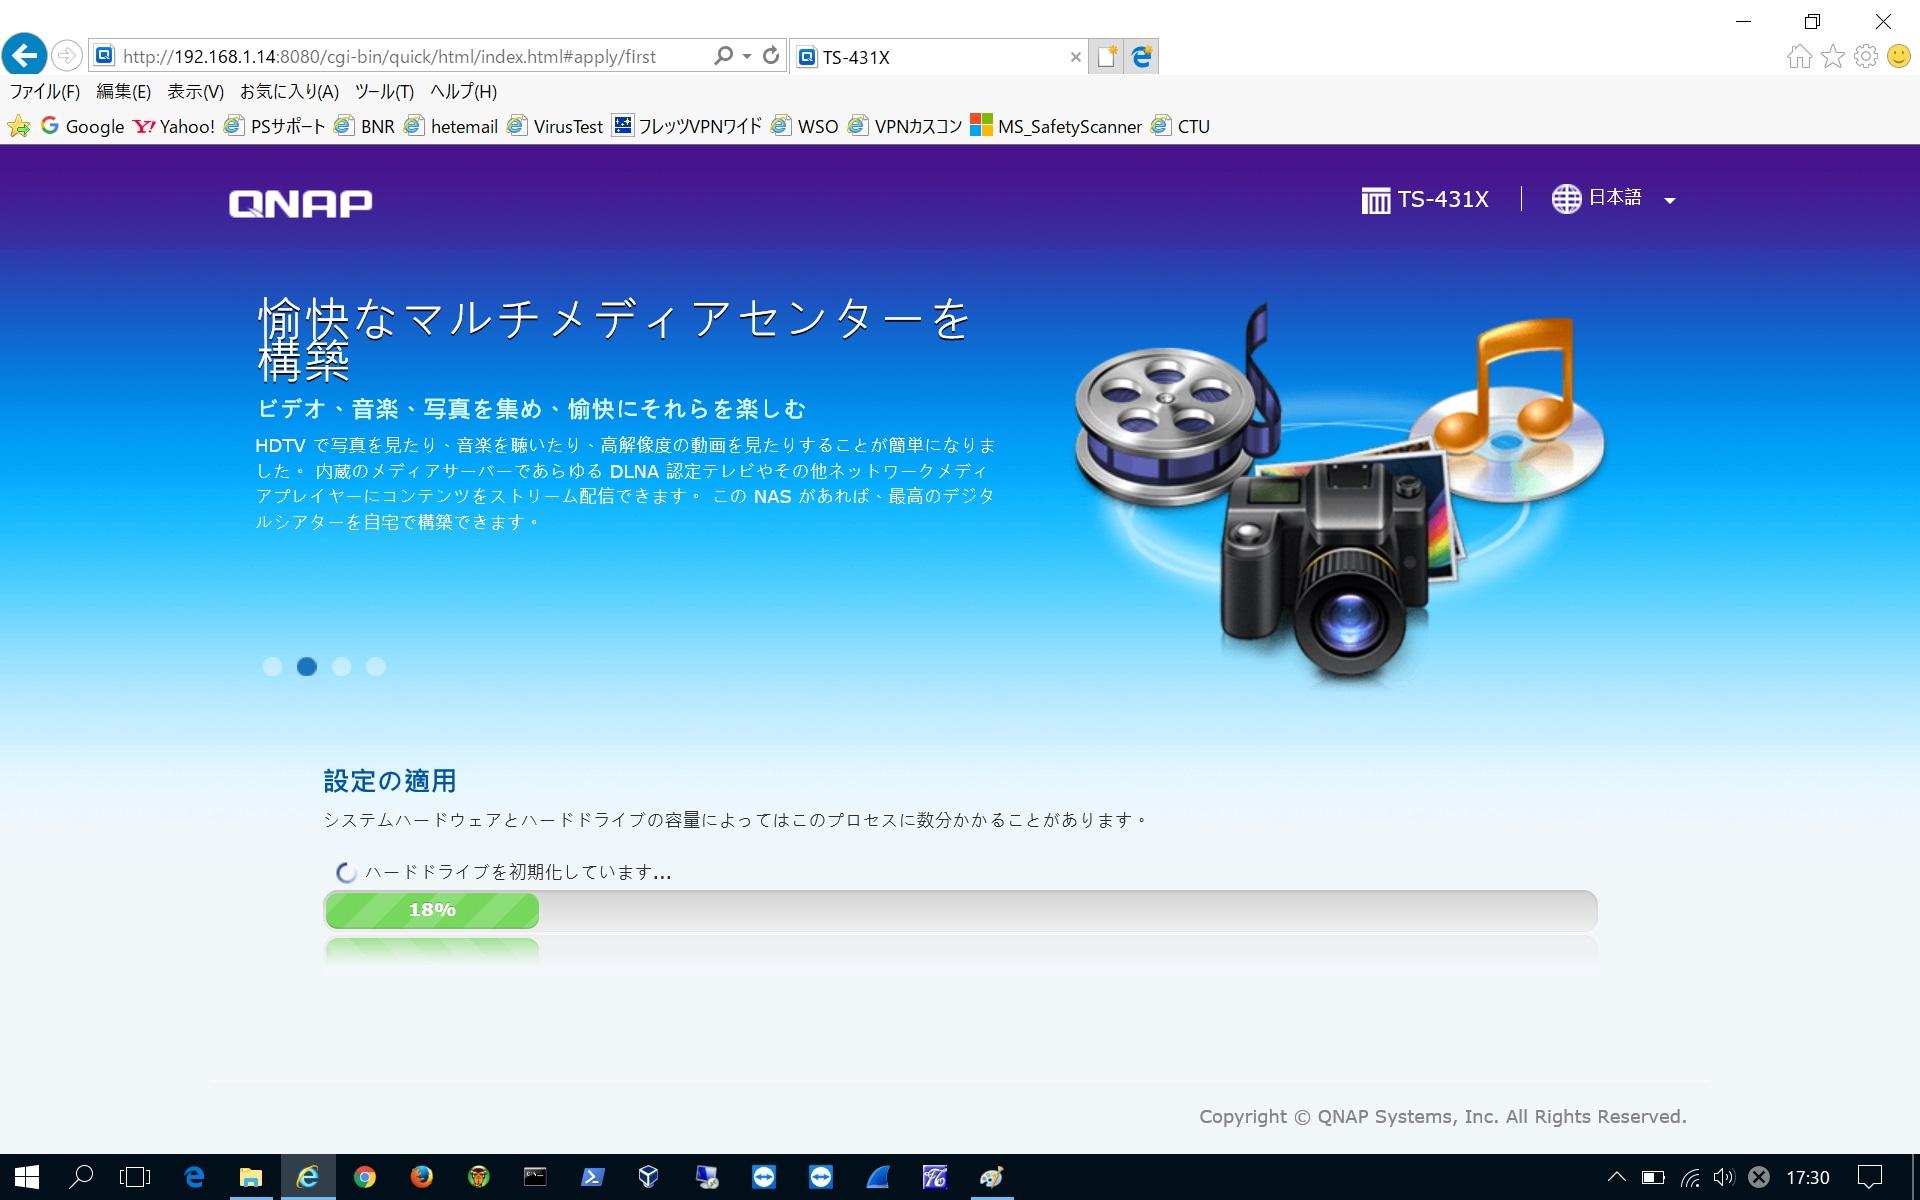 010 QNAP-NAS_install